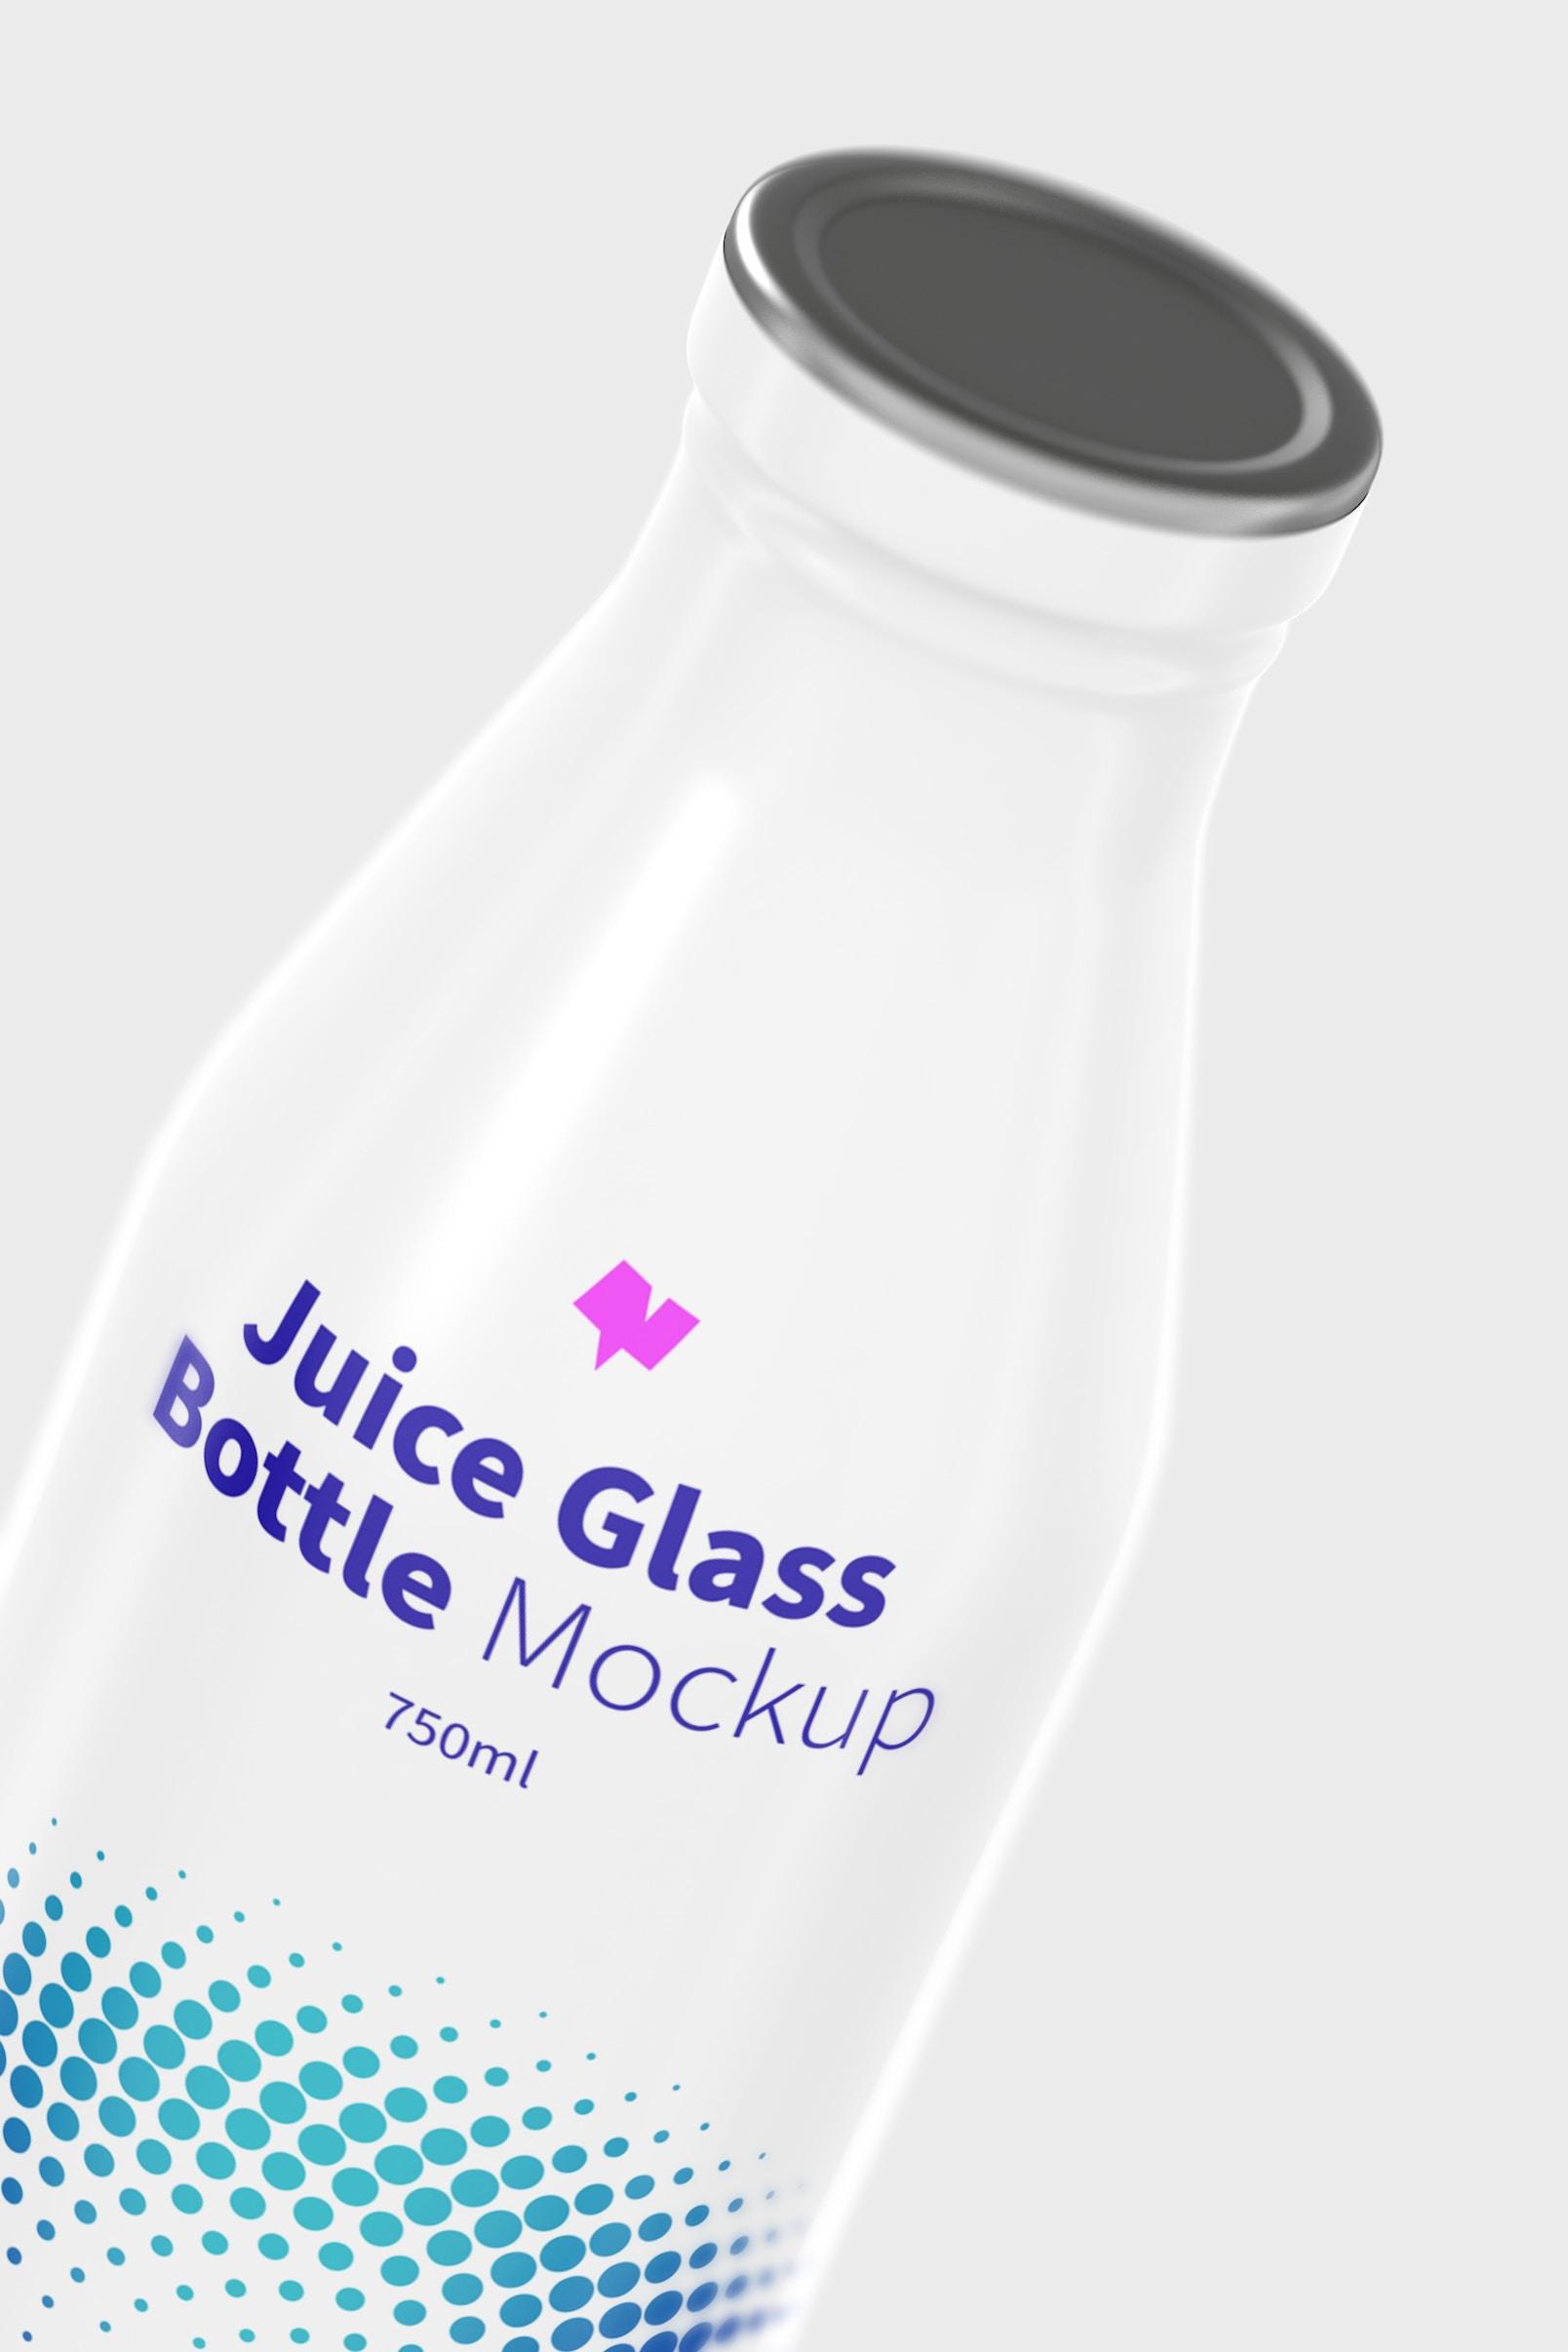 Juice Glass Bottle Mockup, Close-Up